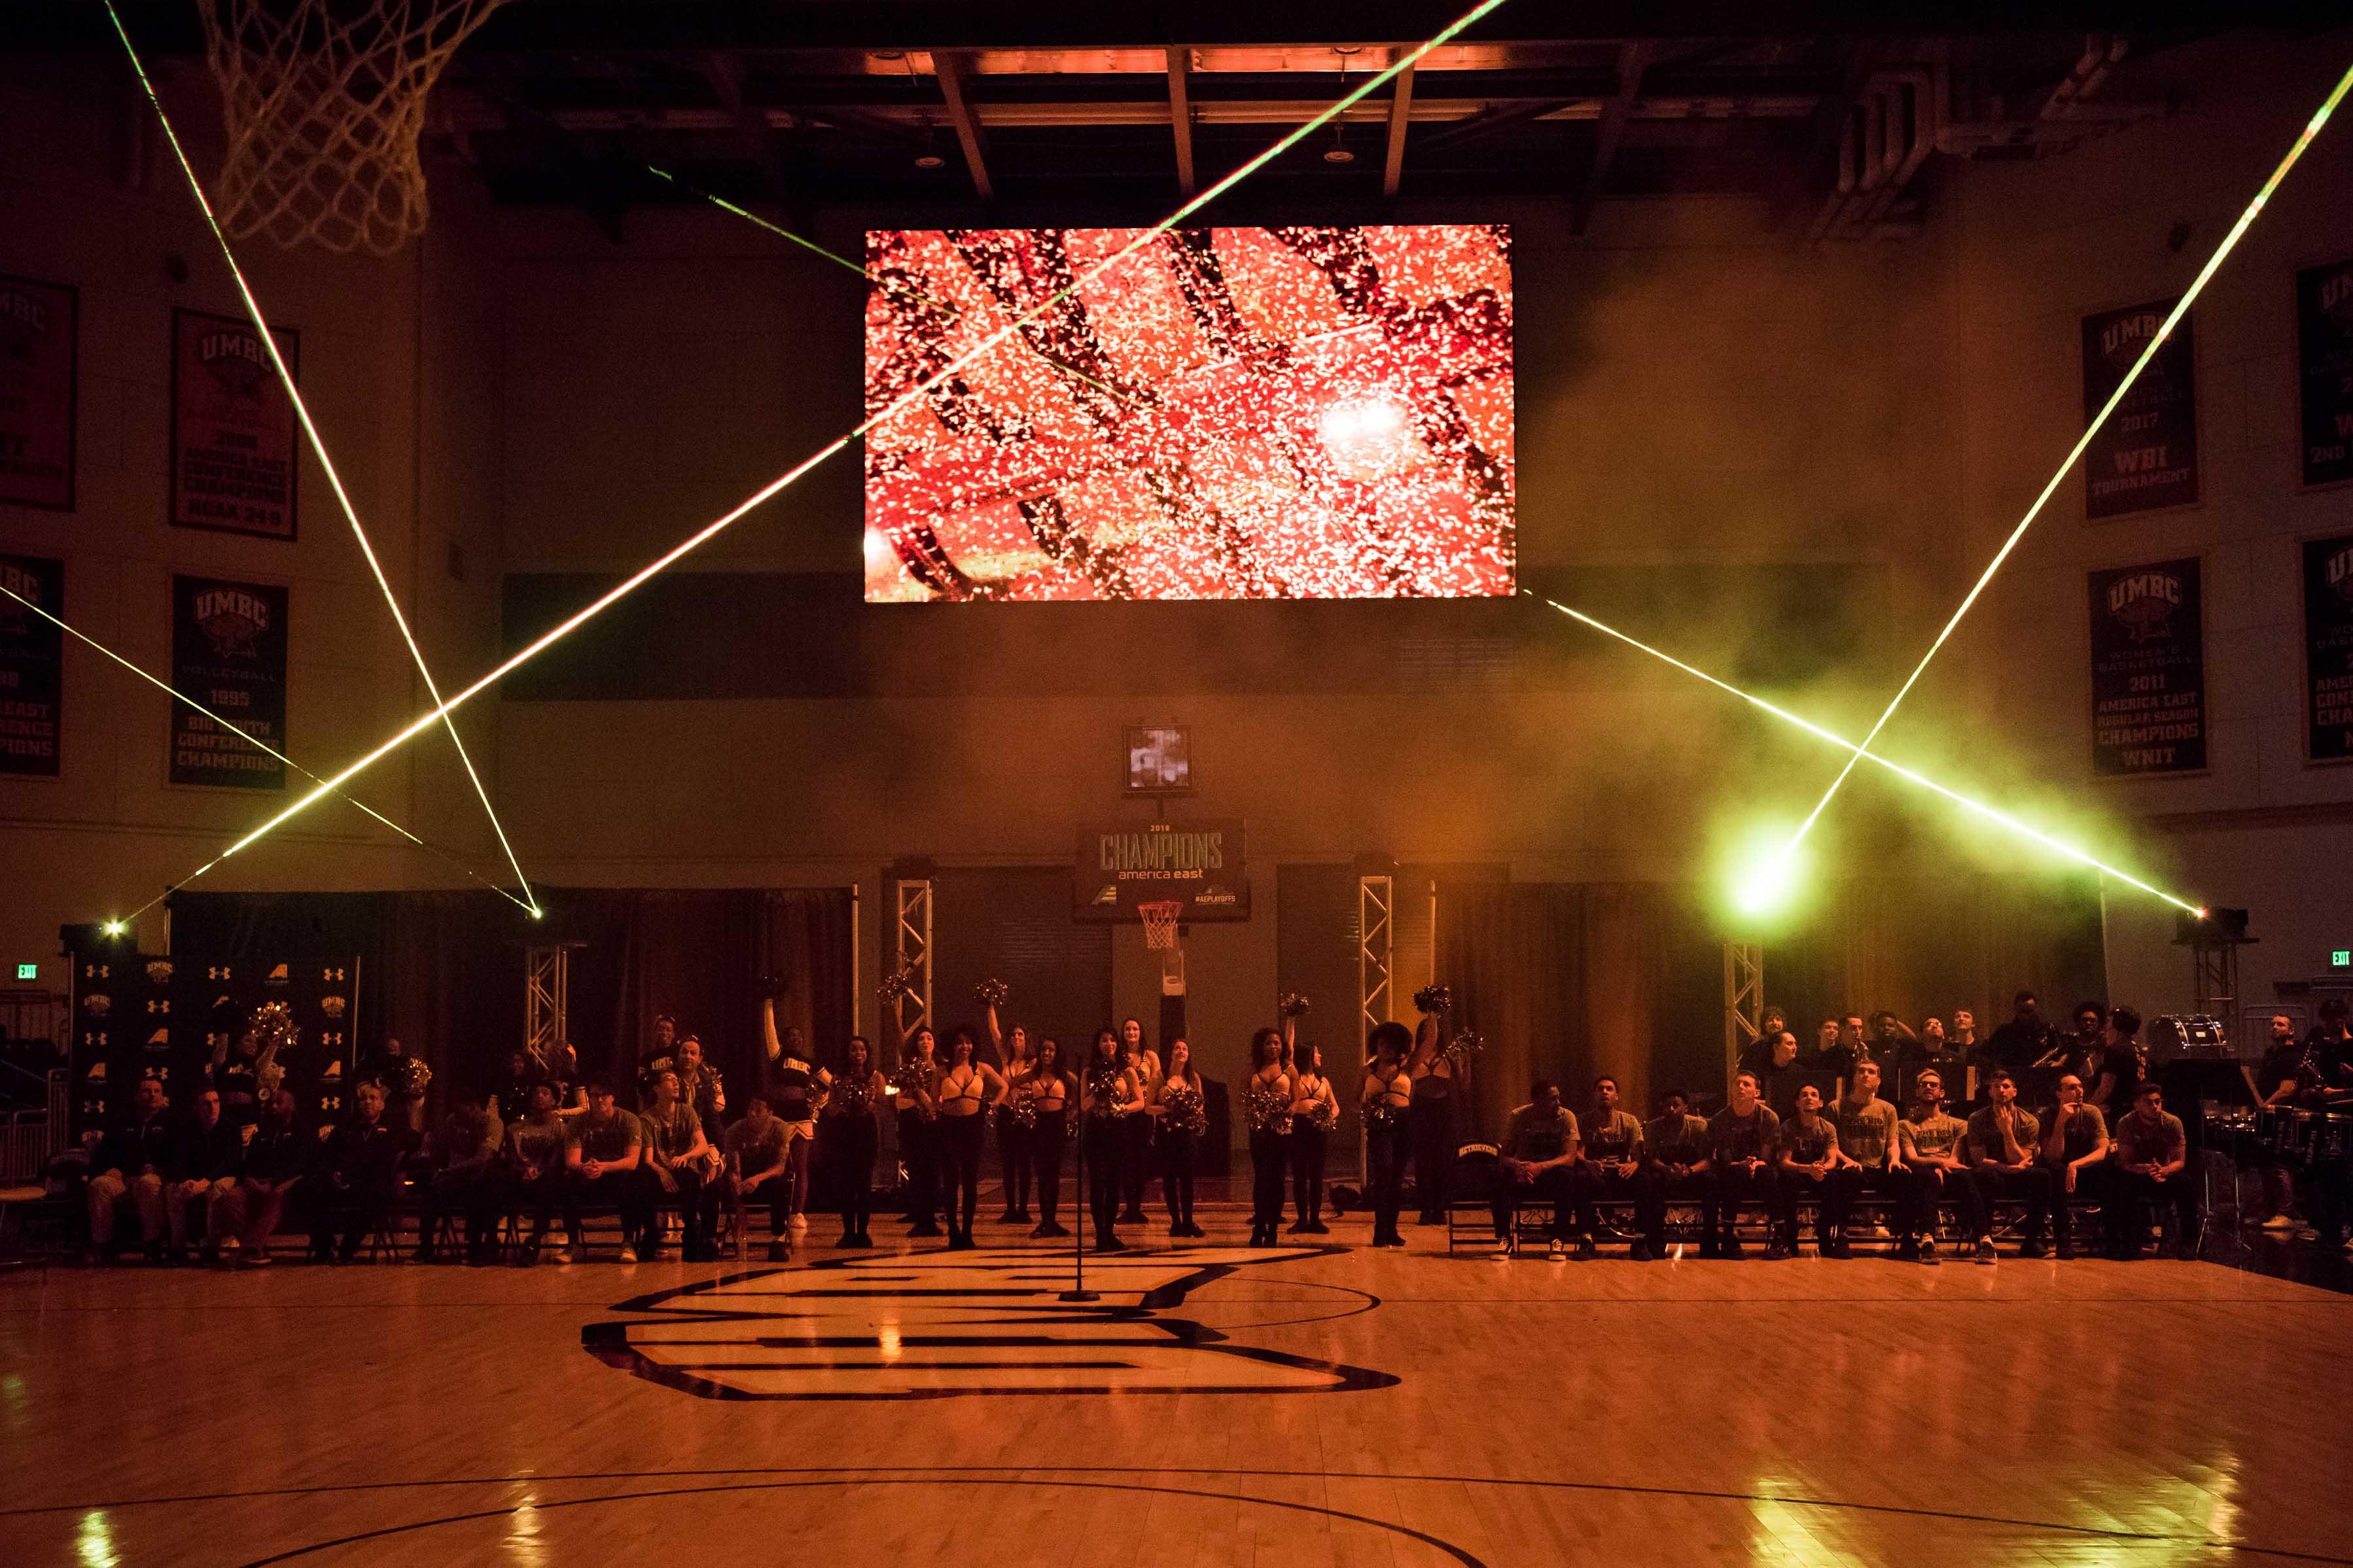 lasers and smoke at men's basketball celebration